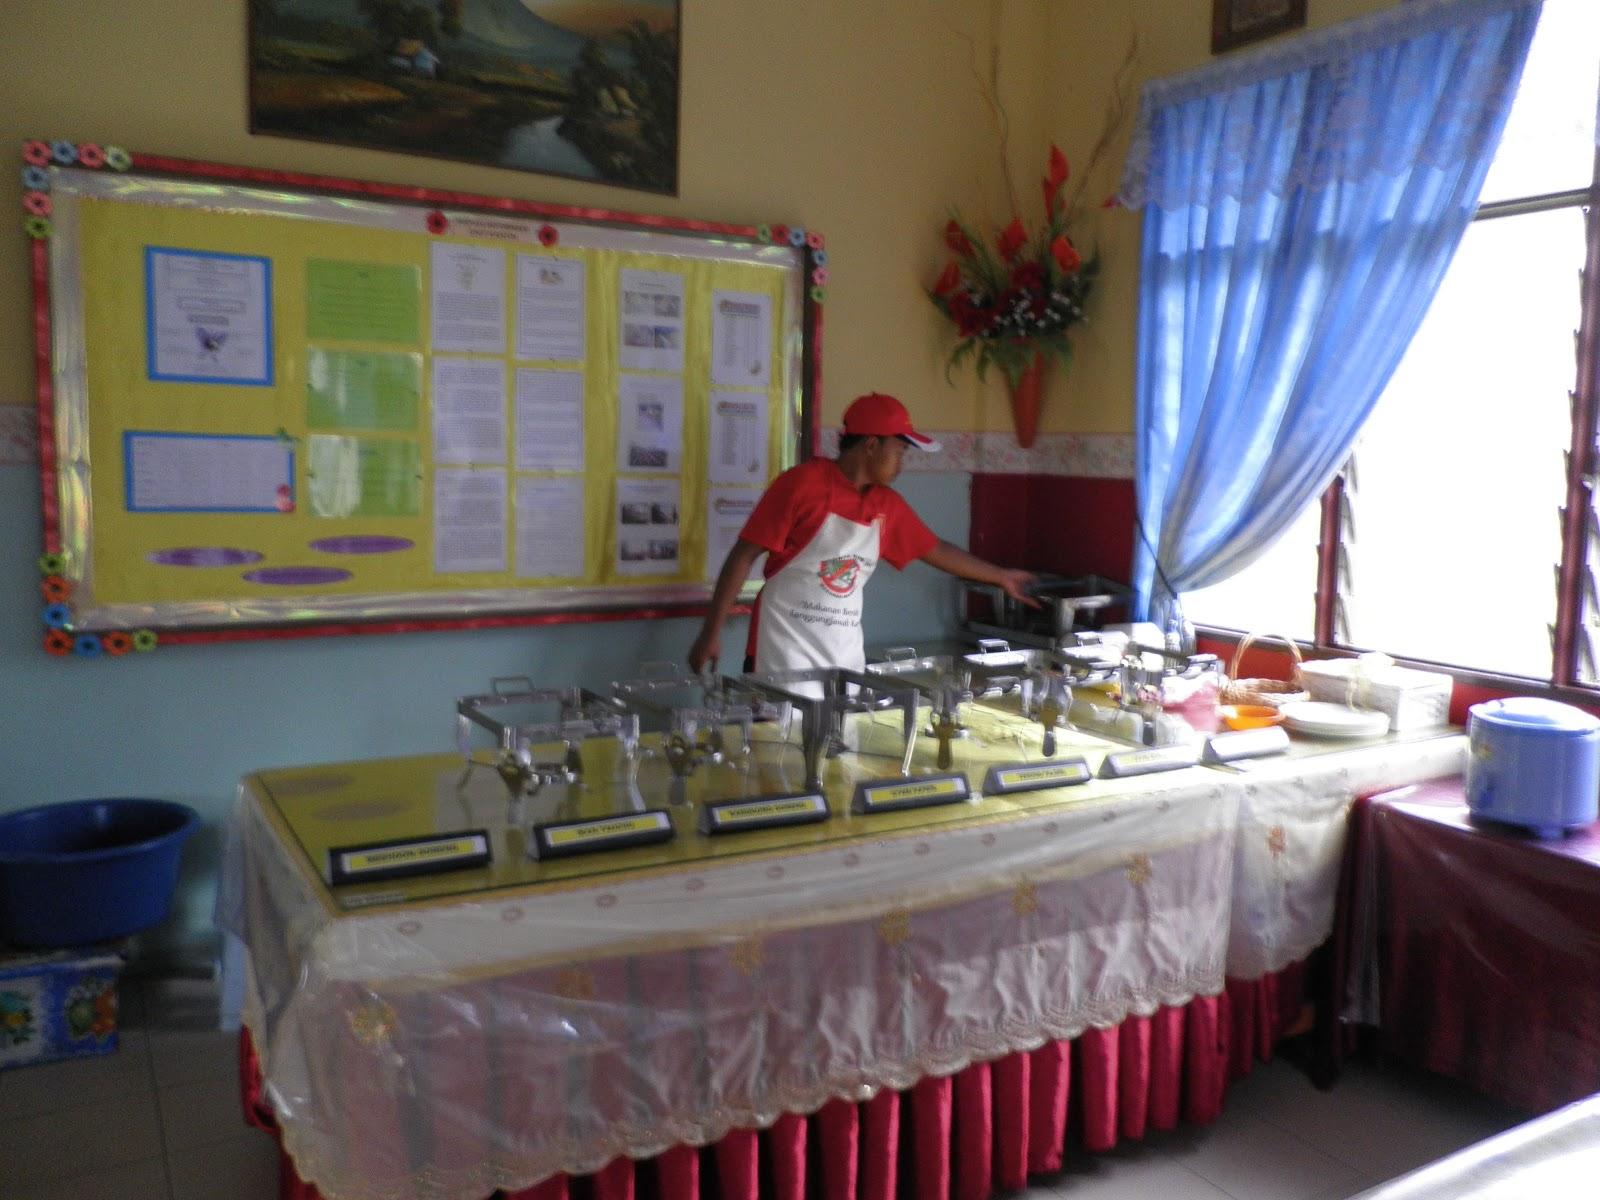 Pan Pemantau Dalam Kalangan Krew Ran Telah Berada Di Kantin Sekolah Sejak Jam 7 00 Pagi Bagi Membuat Diaan Keseluruhan Yang